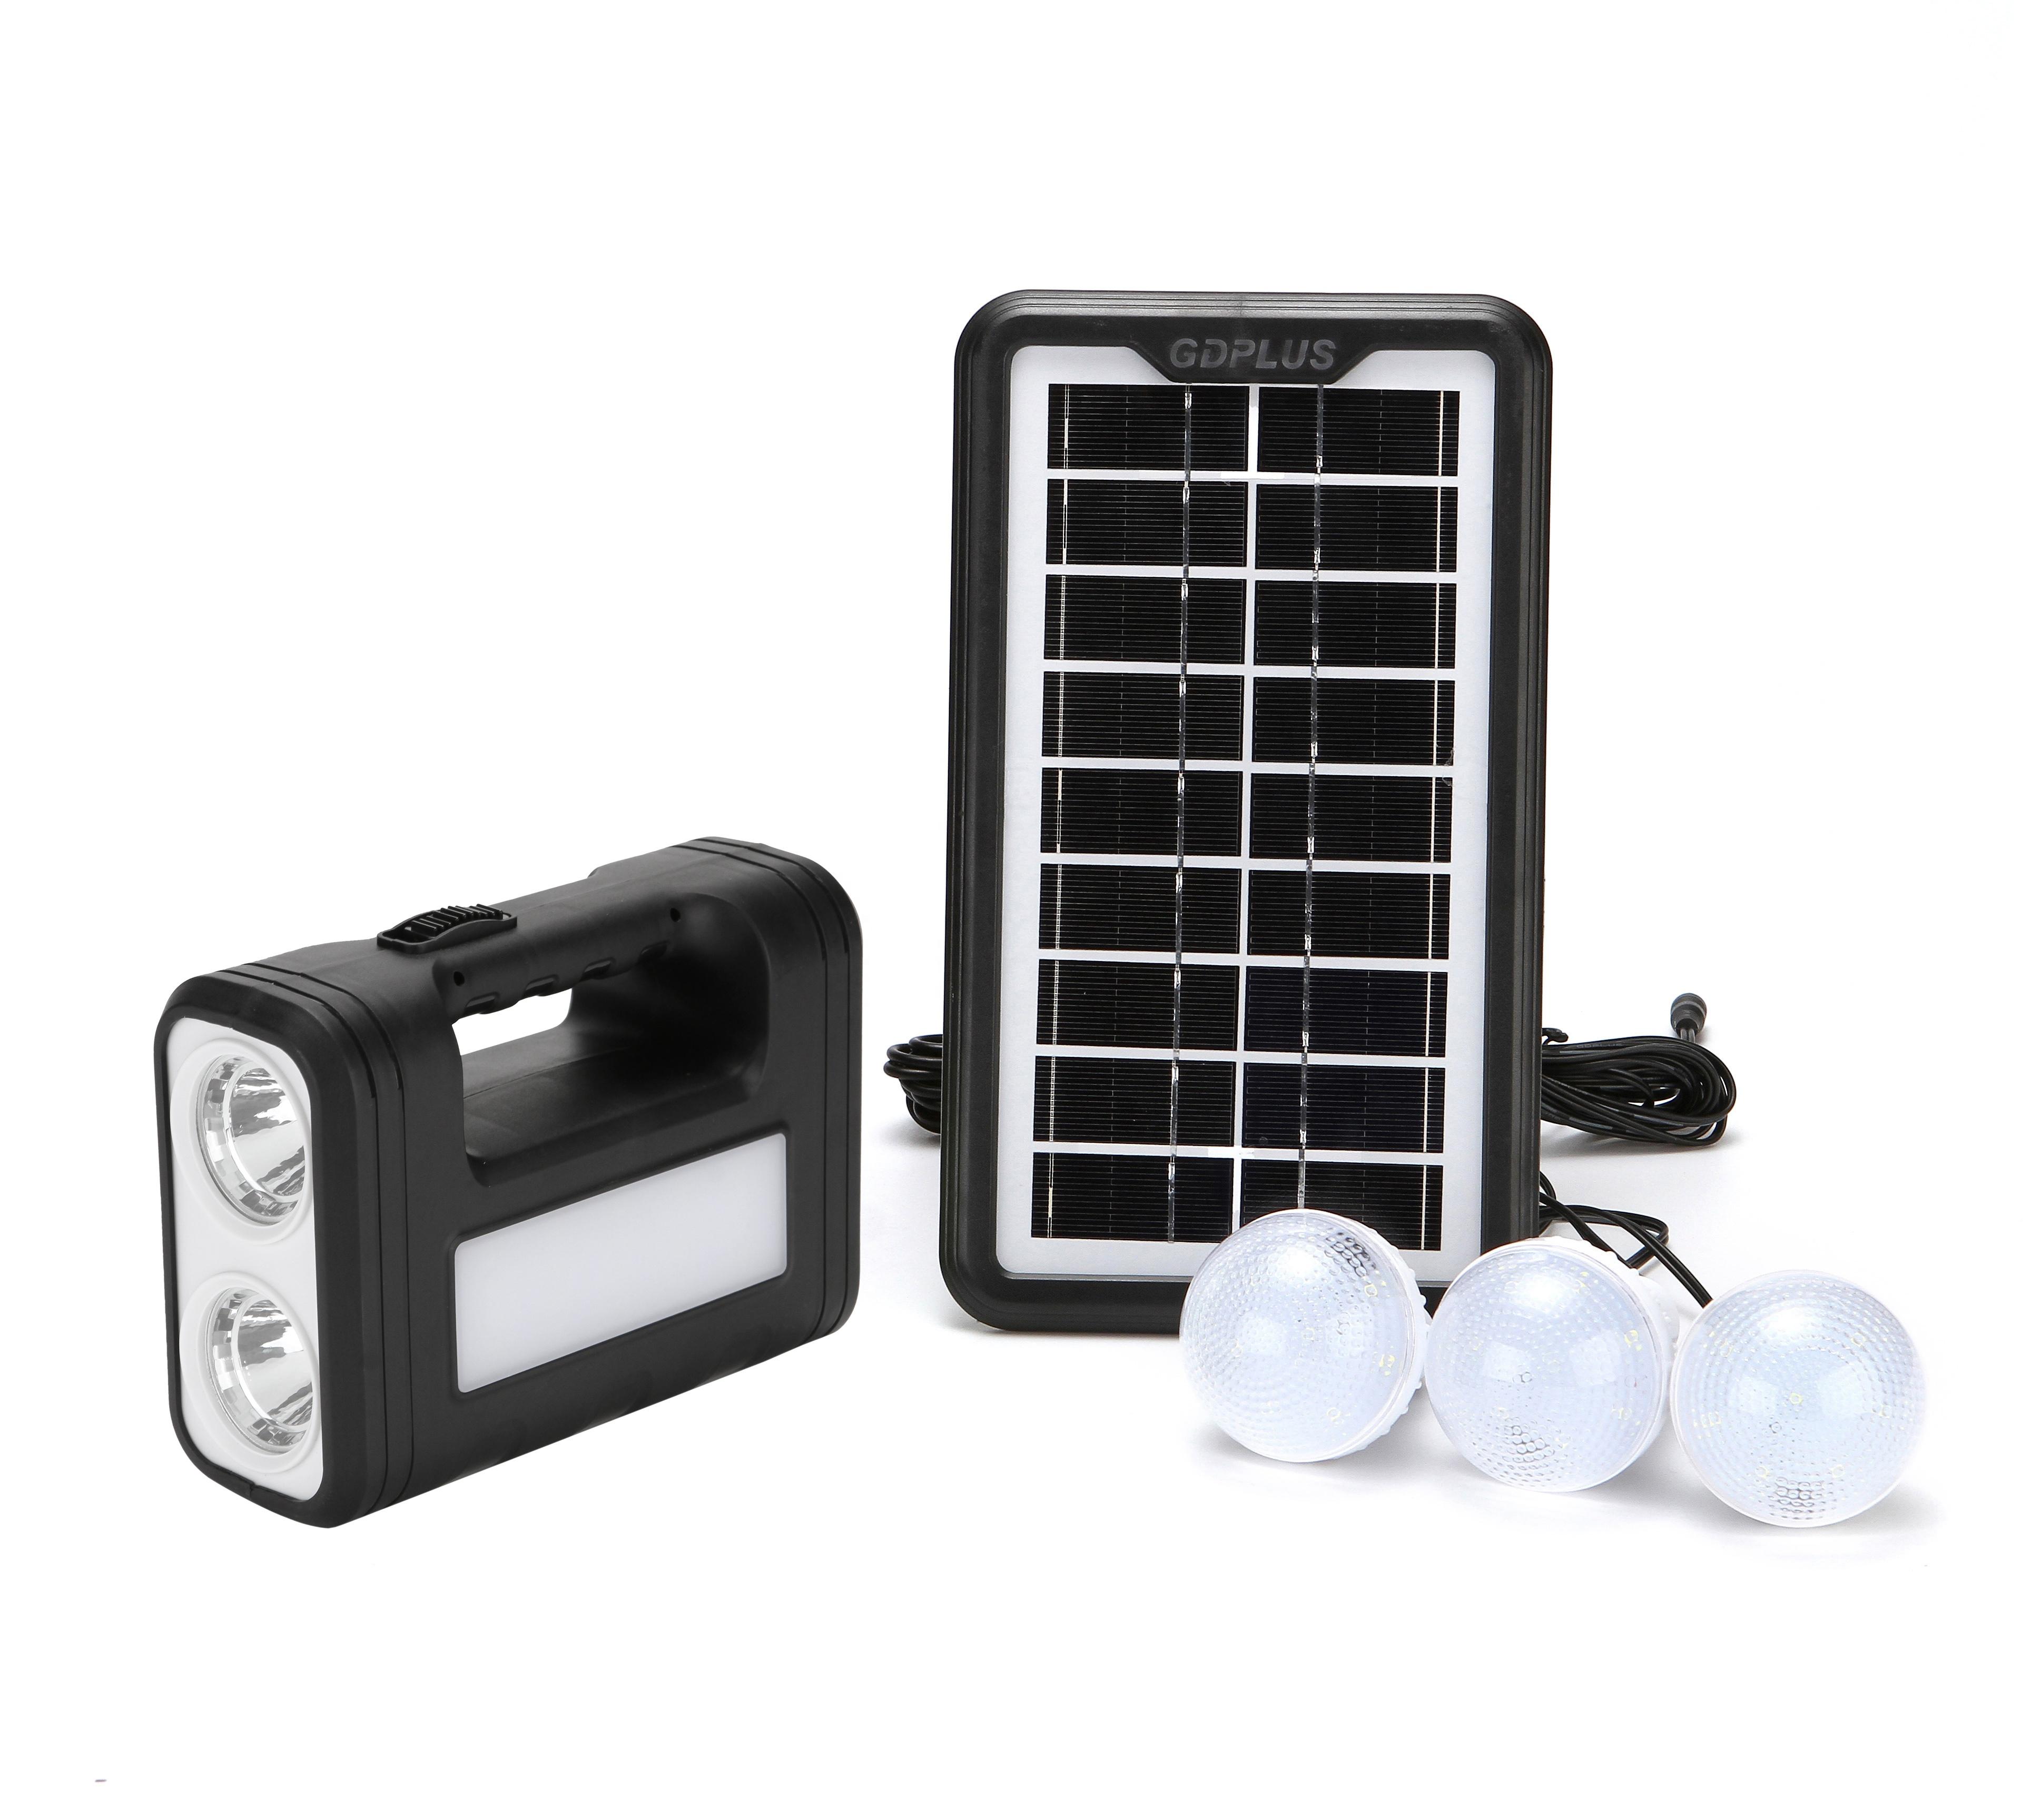 2019 NEW production gdlite gd 8017 solar lighting system